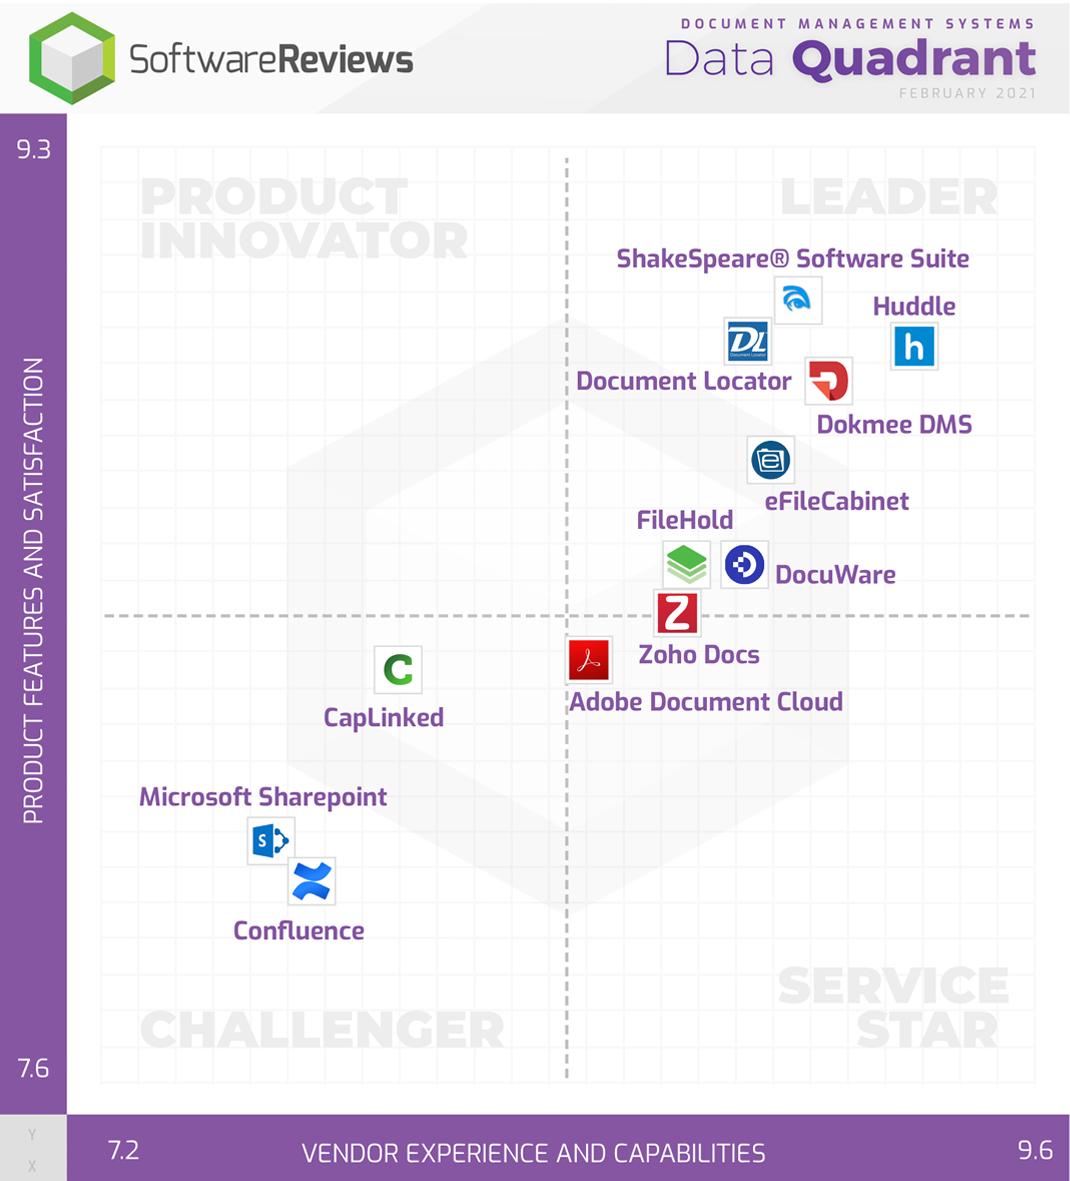 Document Management Systems Data Quadrant